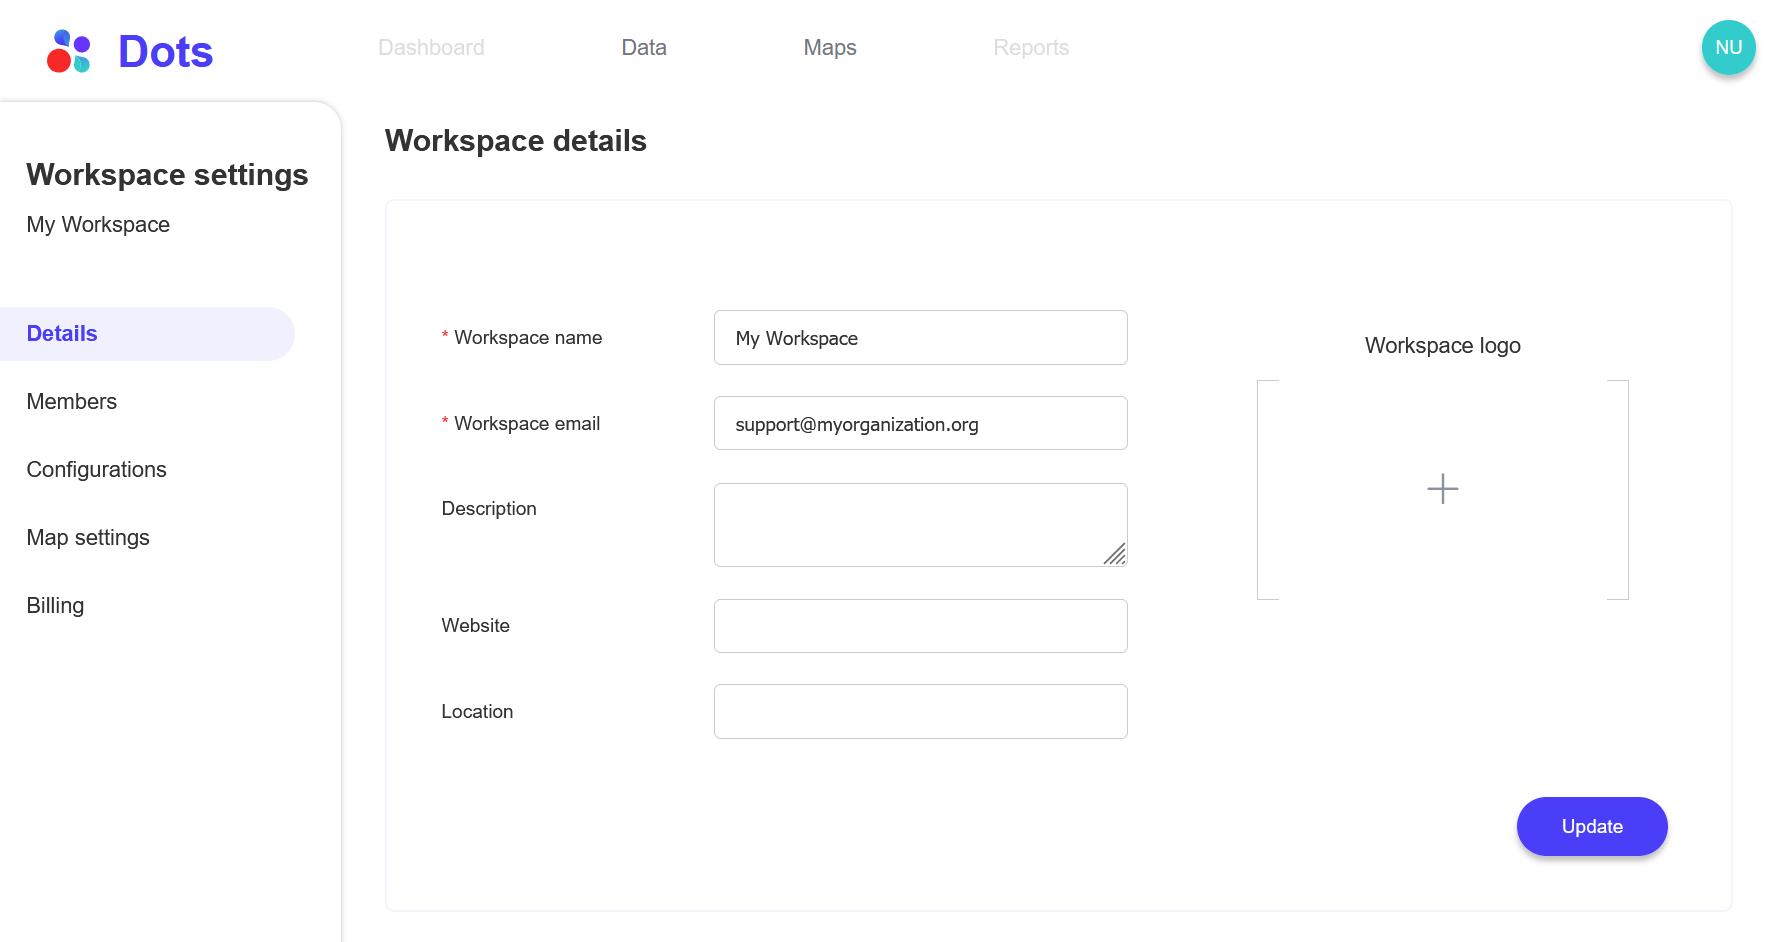 dots-workspace-settings